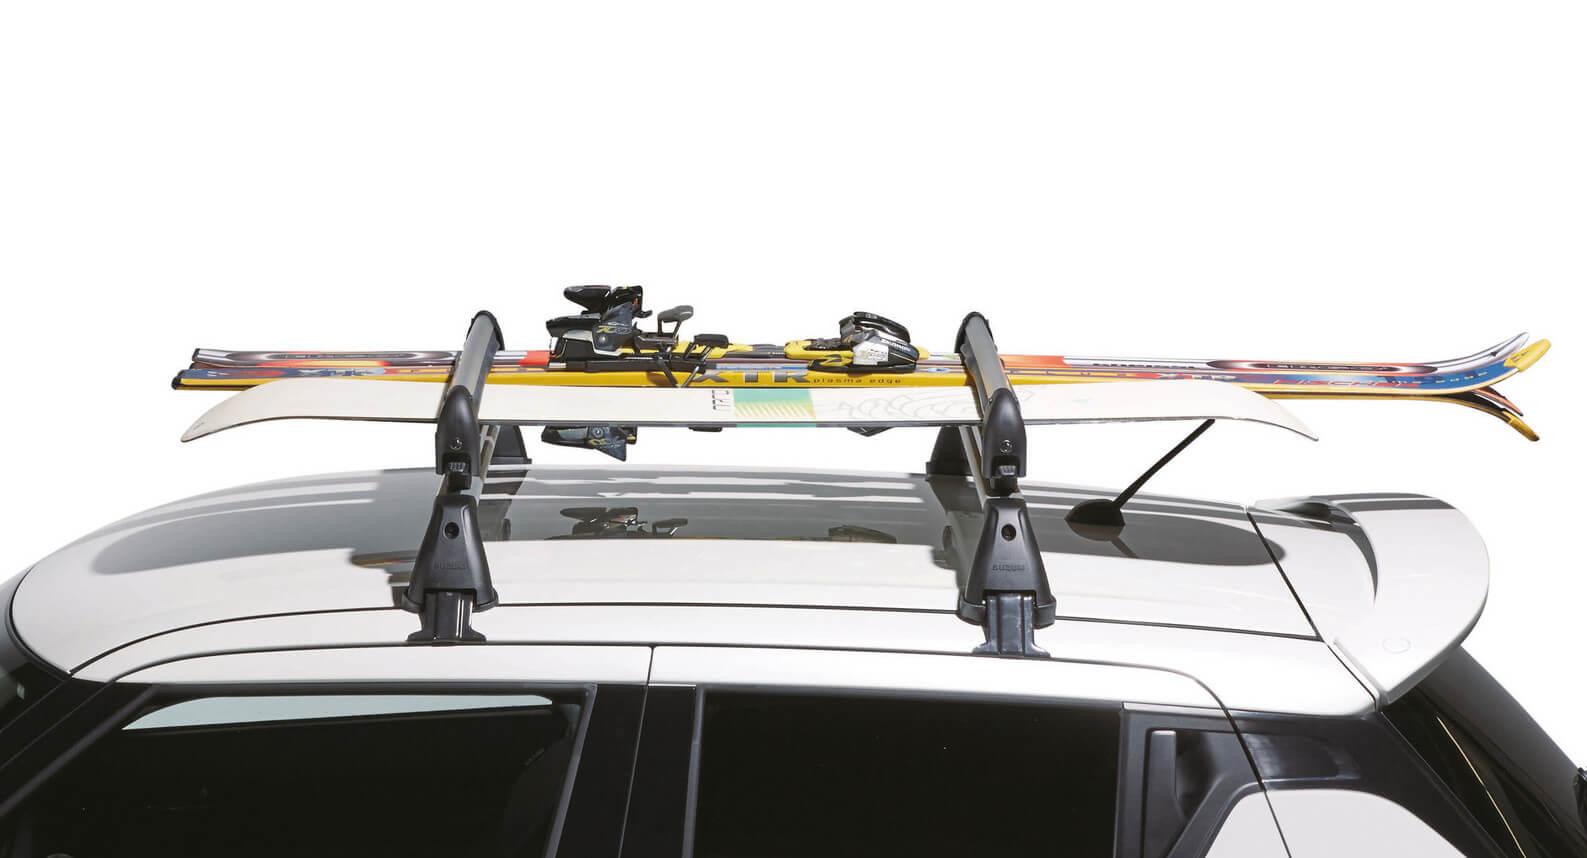 Baleno - Fat Cat 6 Evo, 4 Ski/2 Snowboards